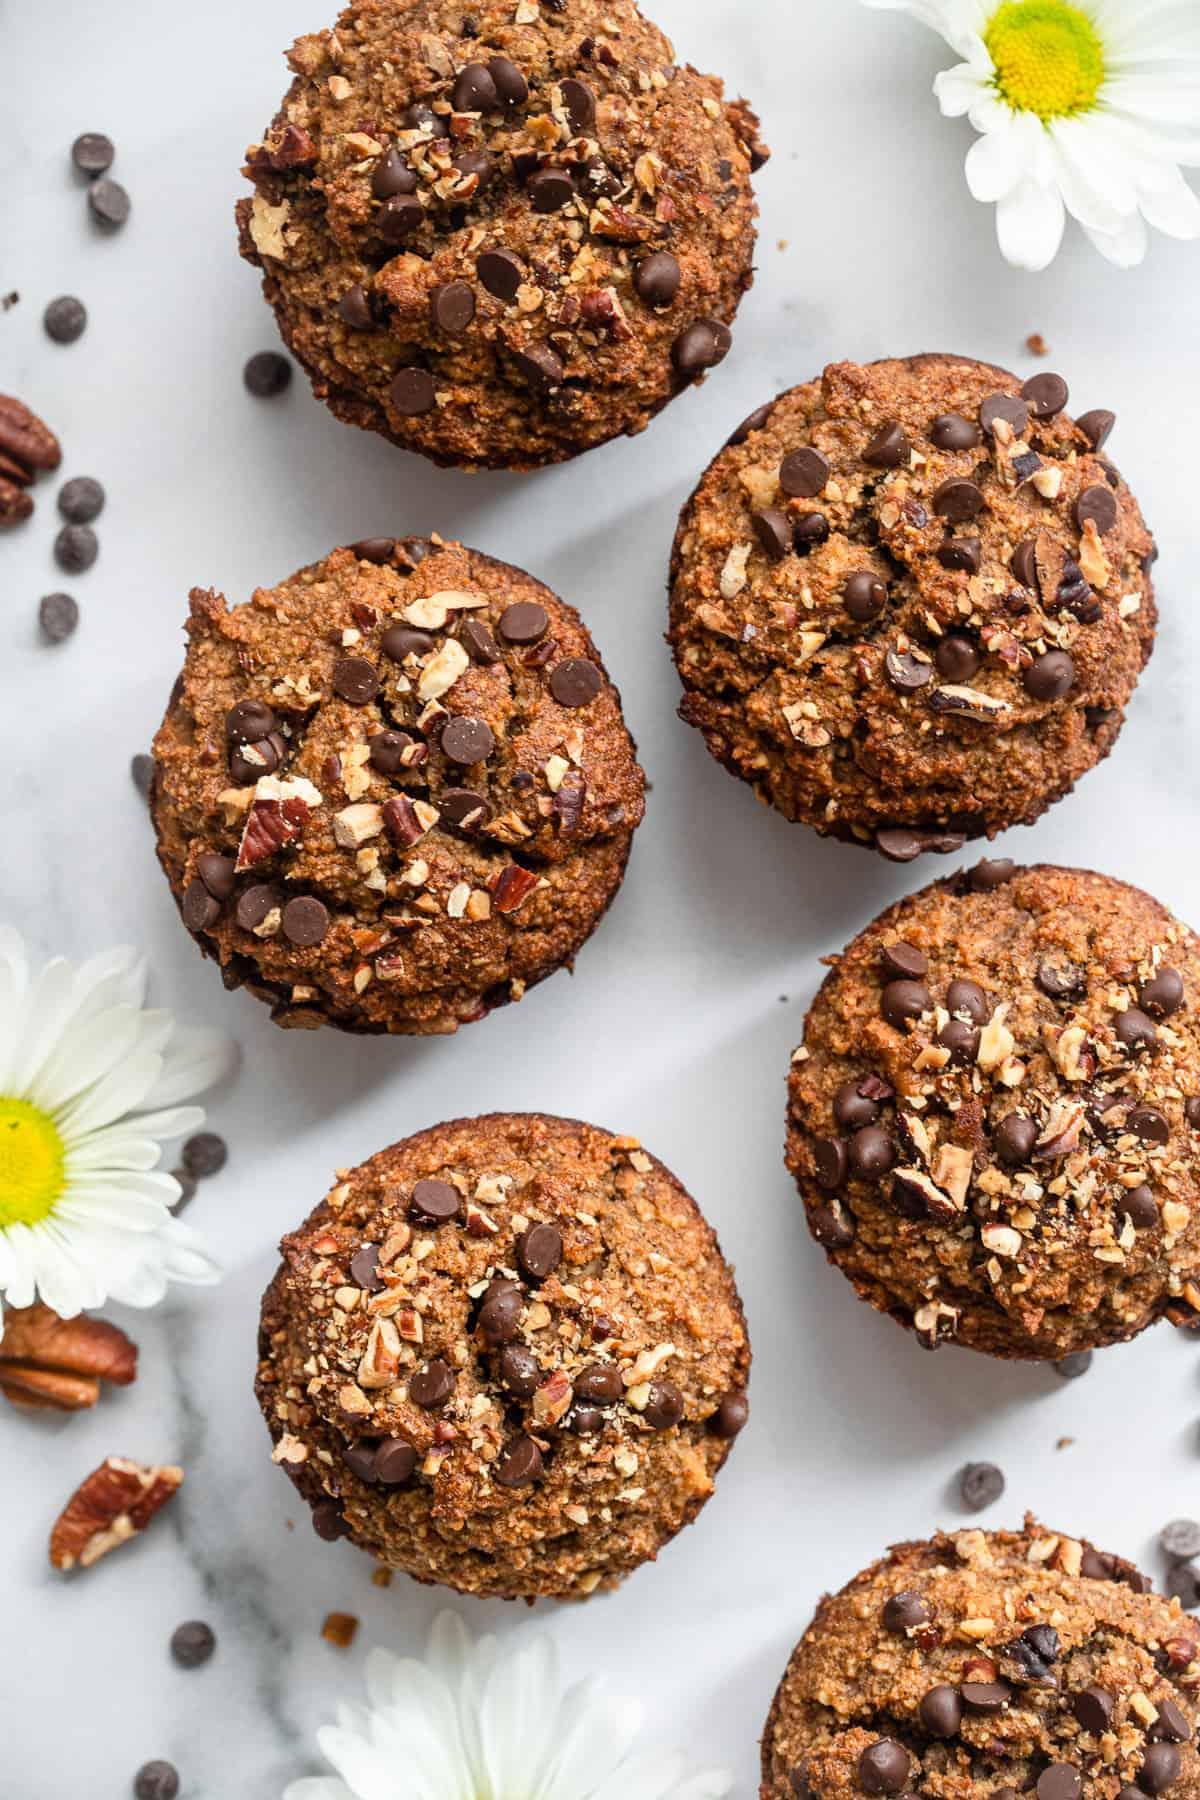 Almond Flour Paleo Banana Nut Muffins